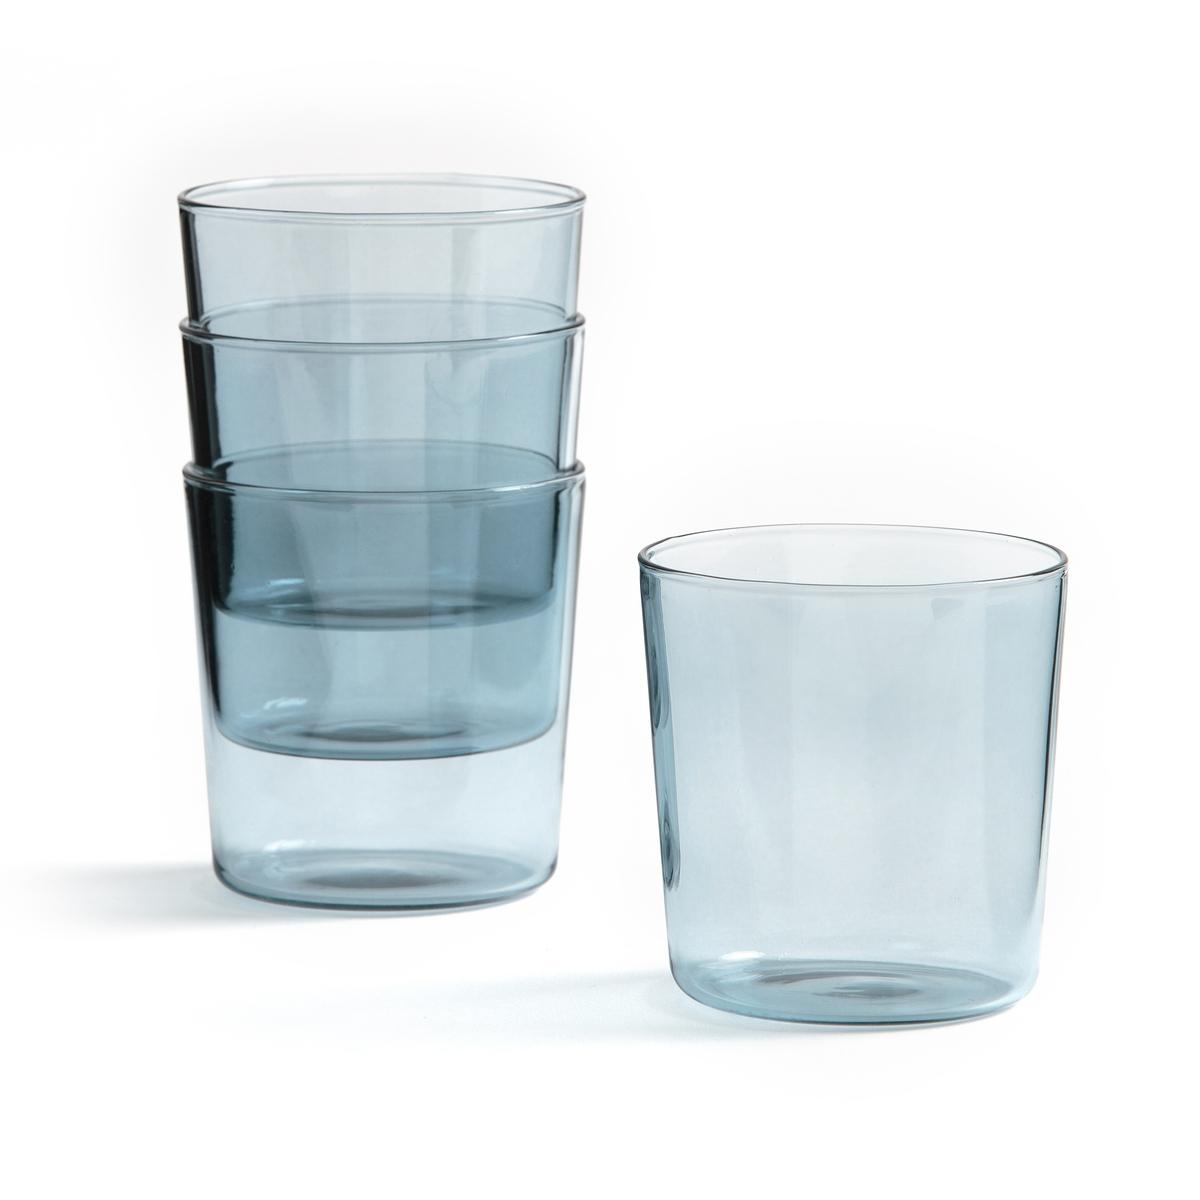 Комплект из 6 стаканов, MIKEL стакан la rochere zinc комплект из 6 шт 615001